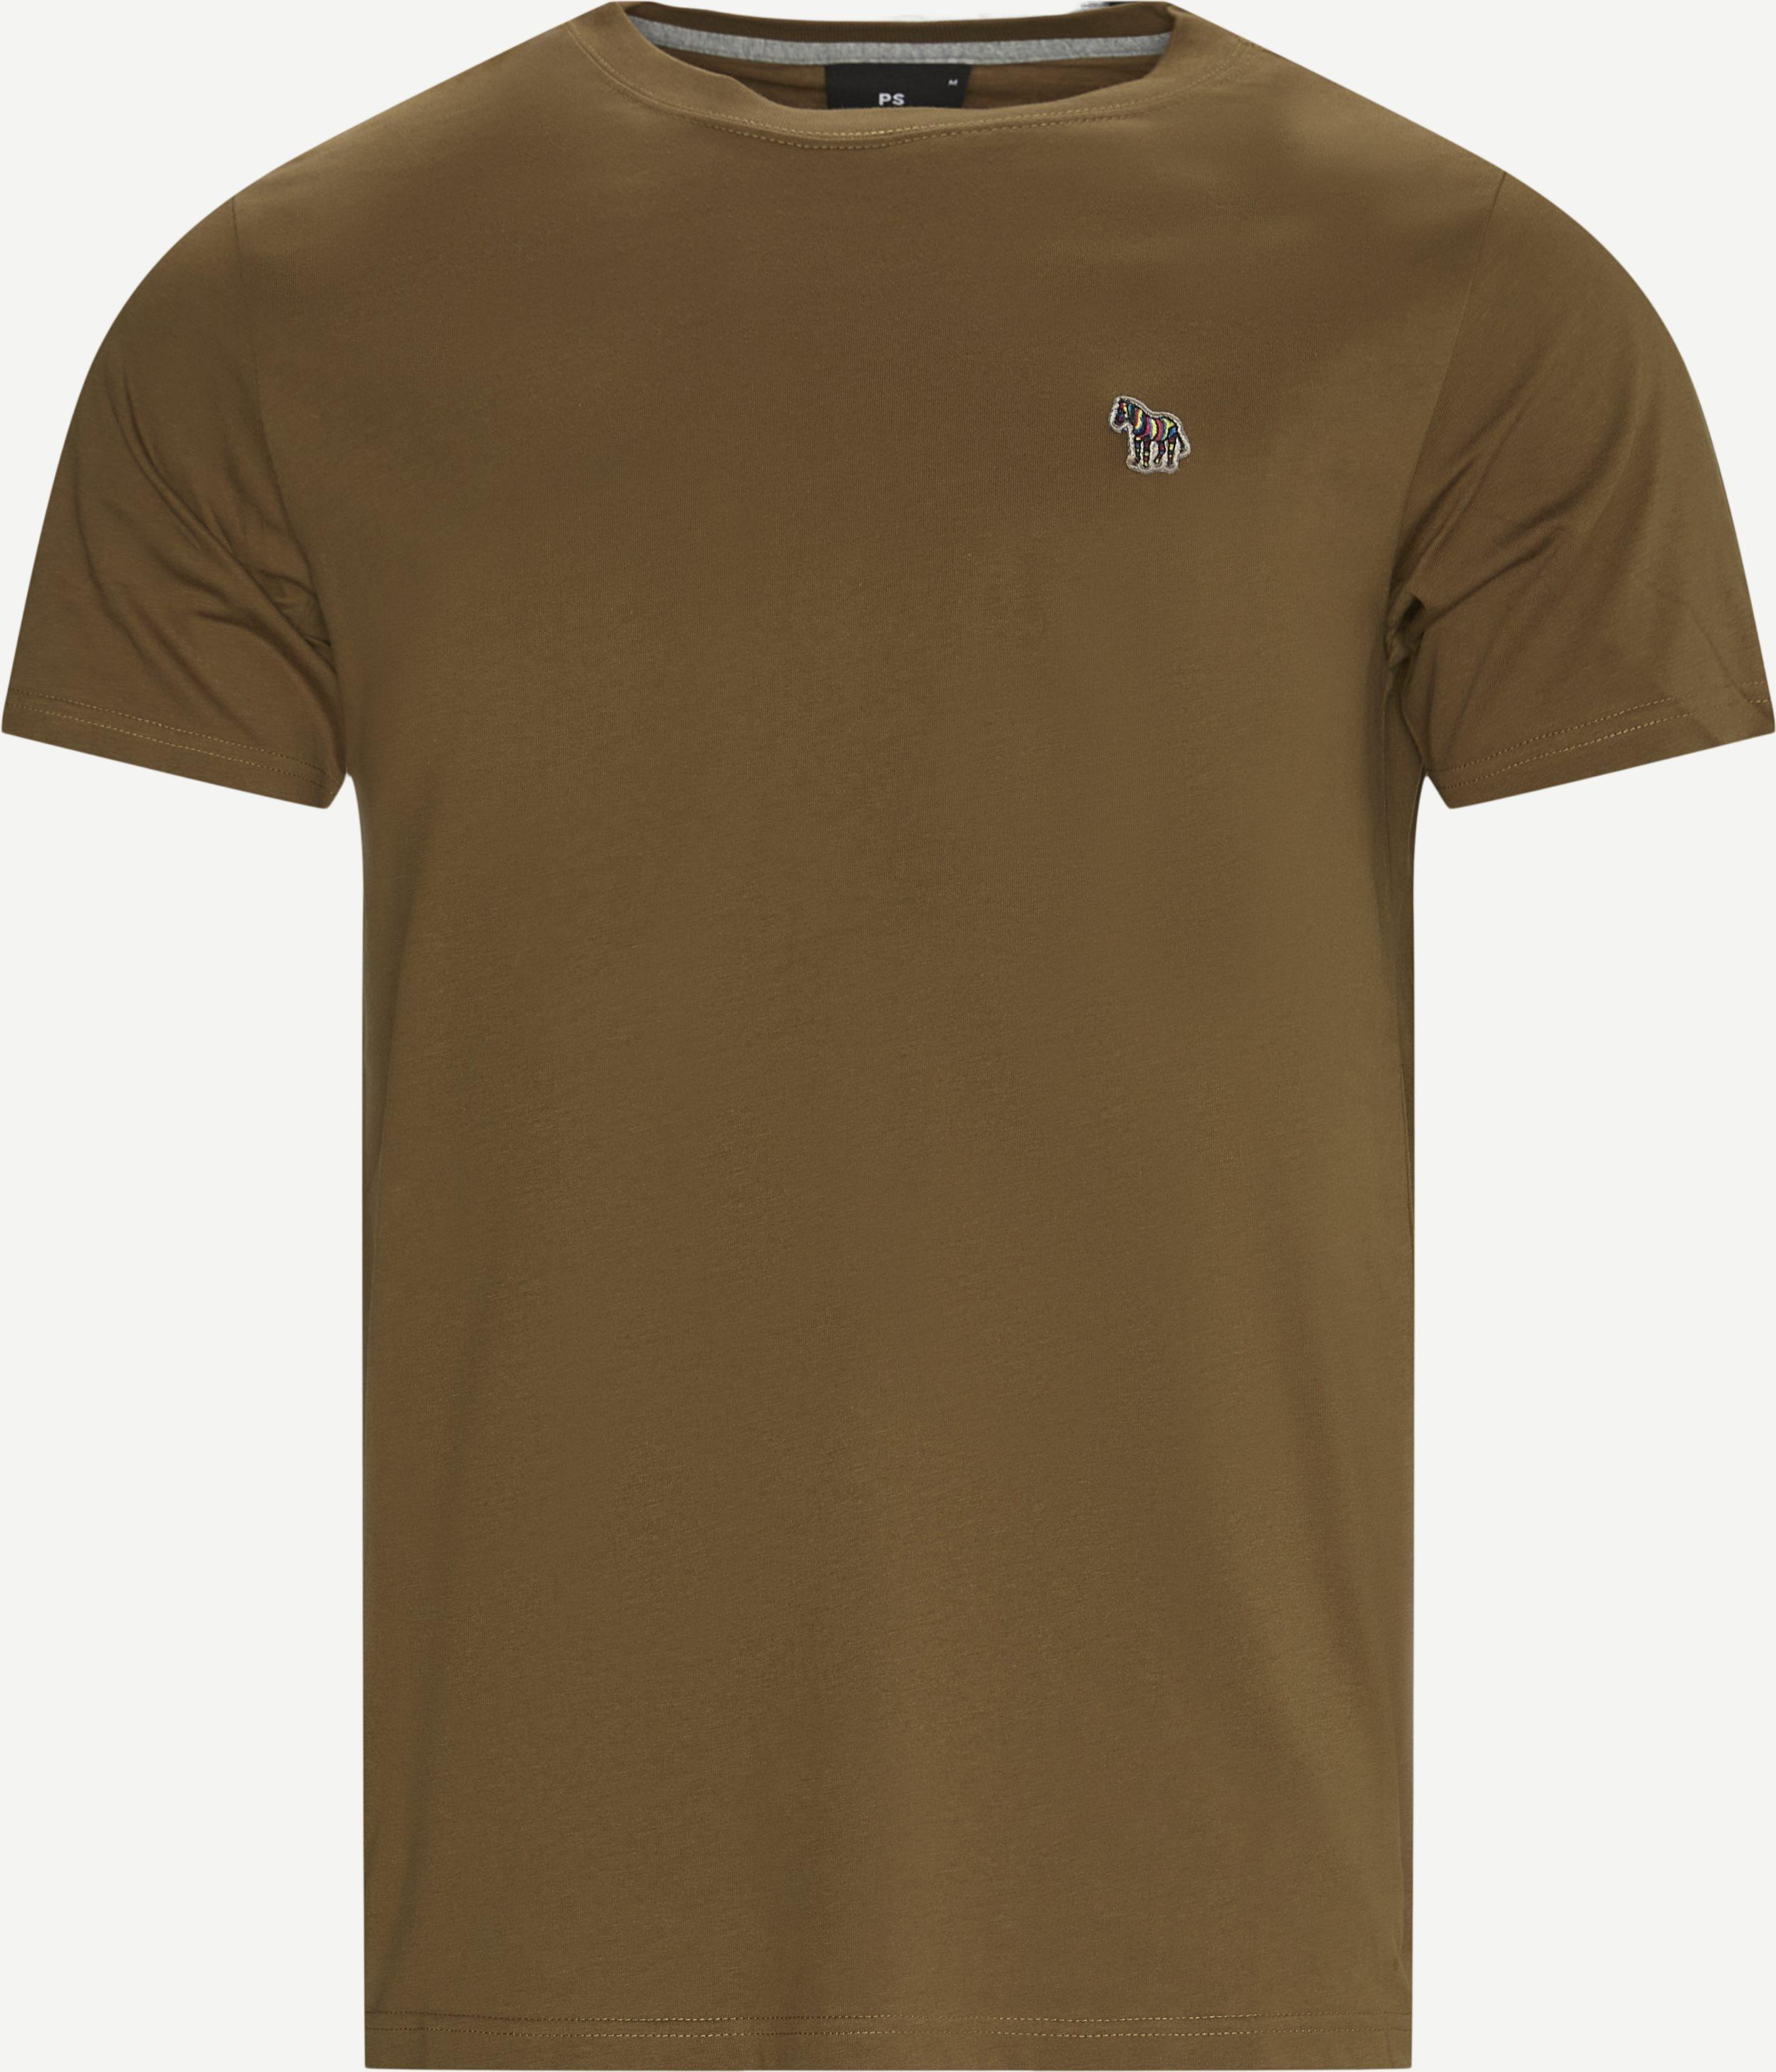 Logo T-shirt - T-shirts - Regular - Army